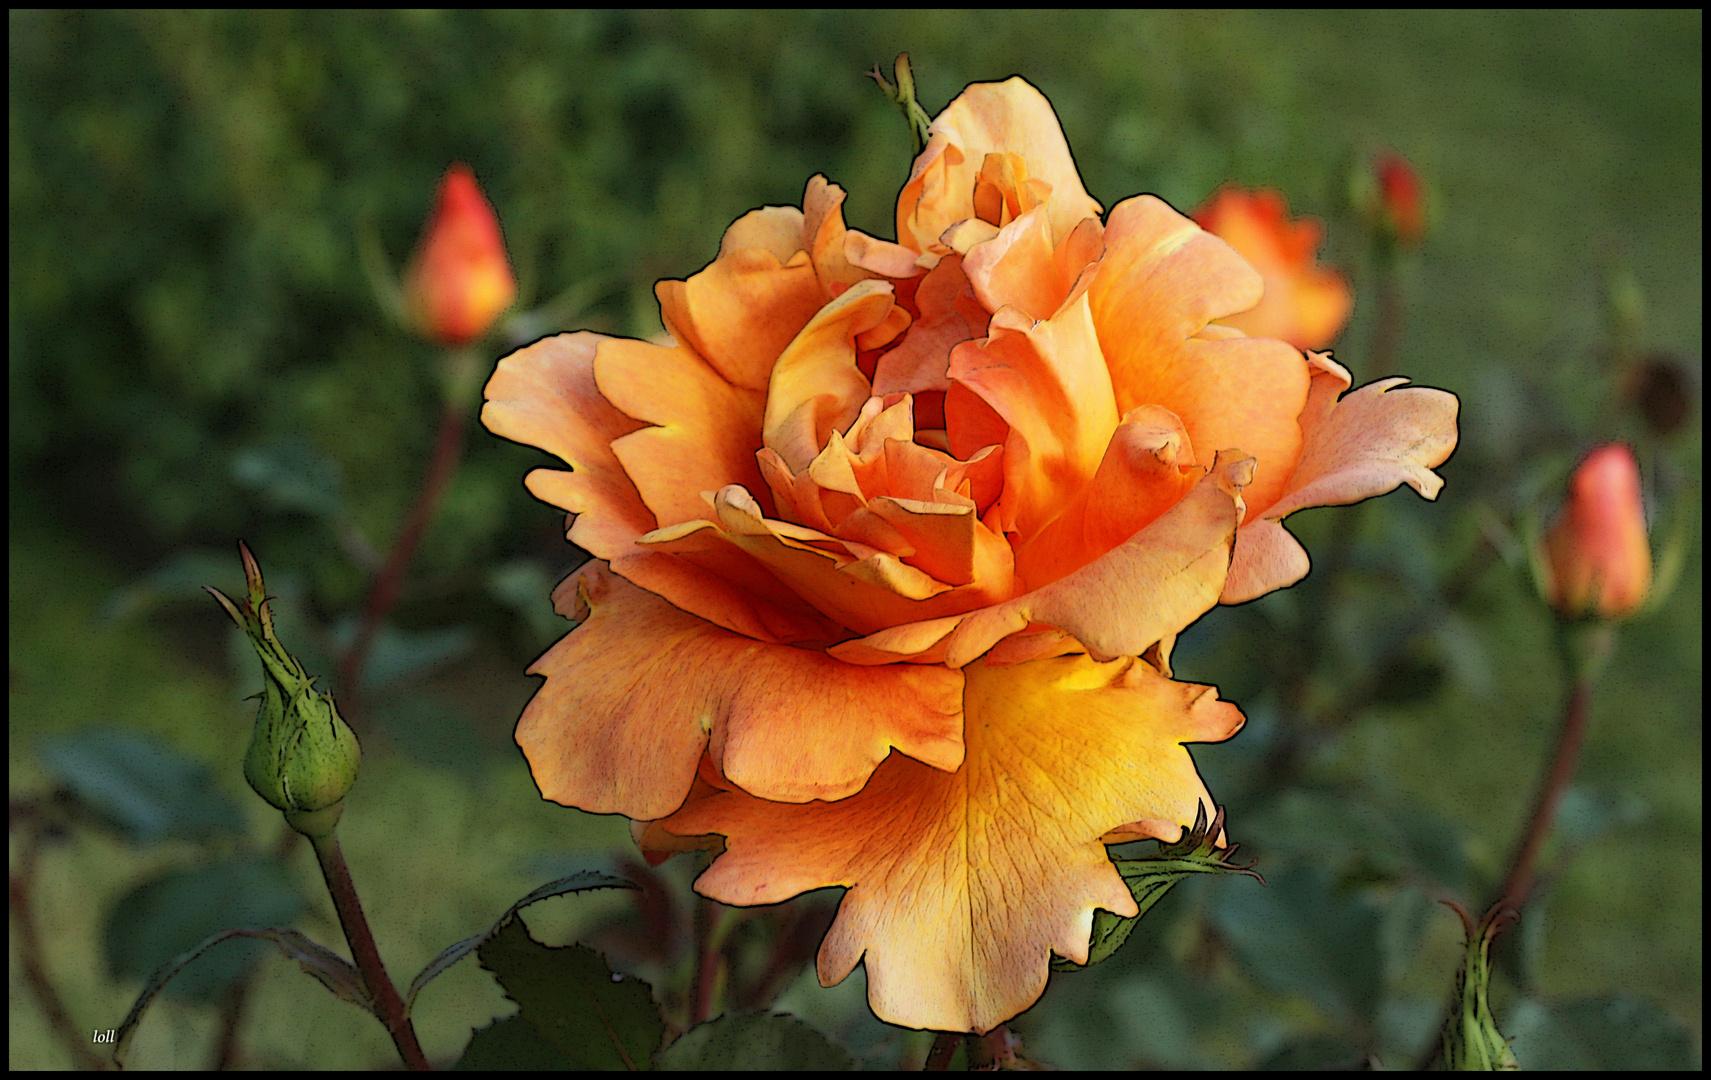 ...rosa...